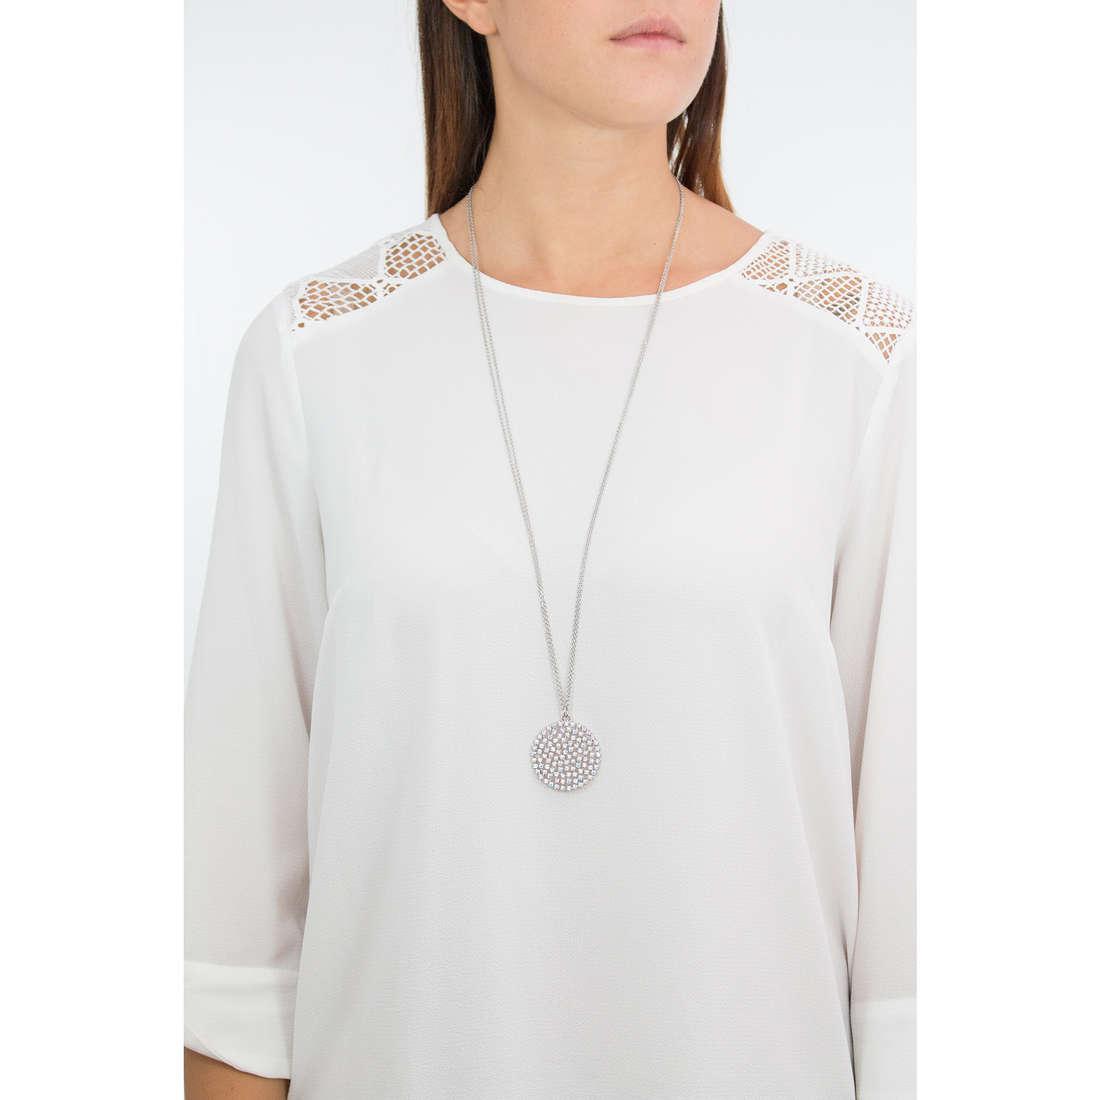 Luca Barra necklaces woman LBCK1067 indosso